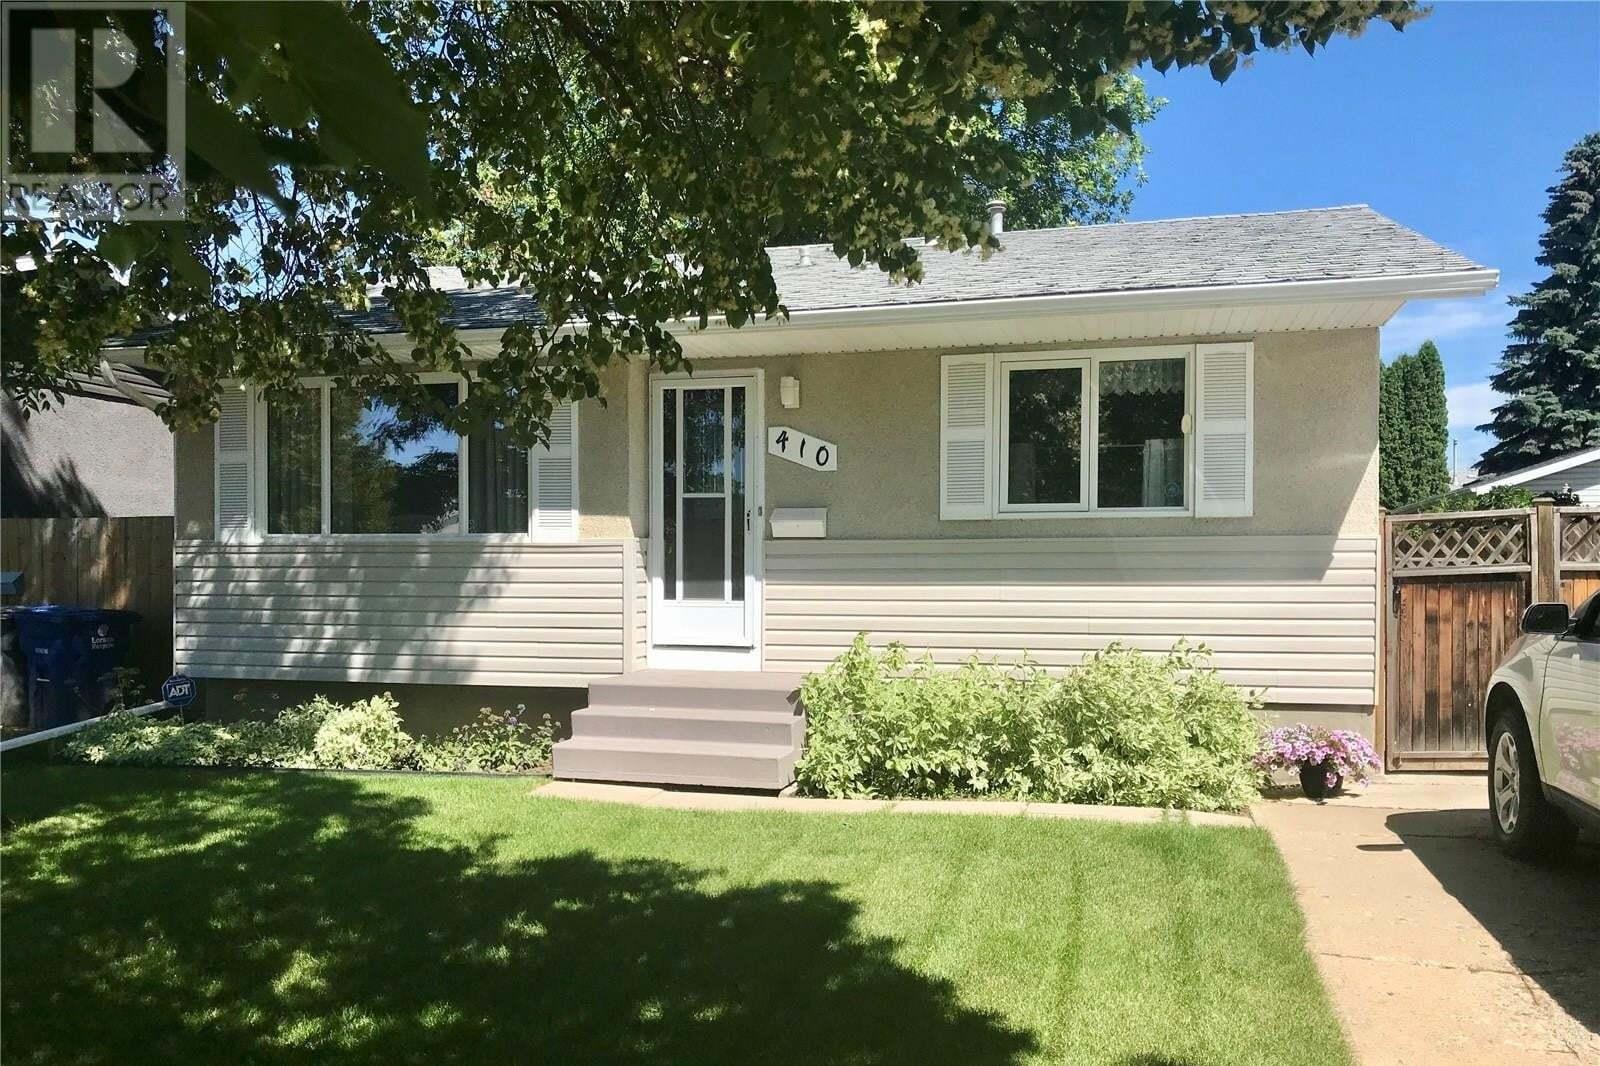 House for sale at 410 St Laurent Cres Saskatoon Saskatchewan - MLS: SK818233